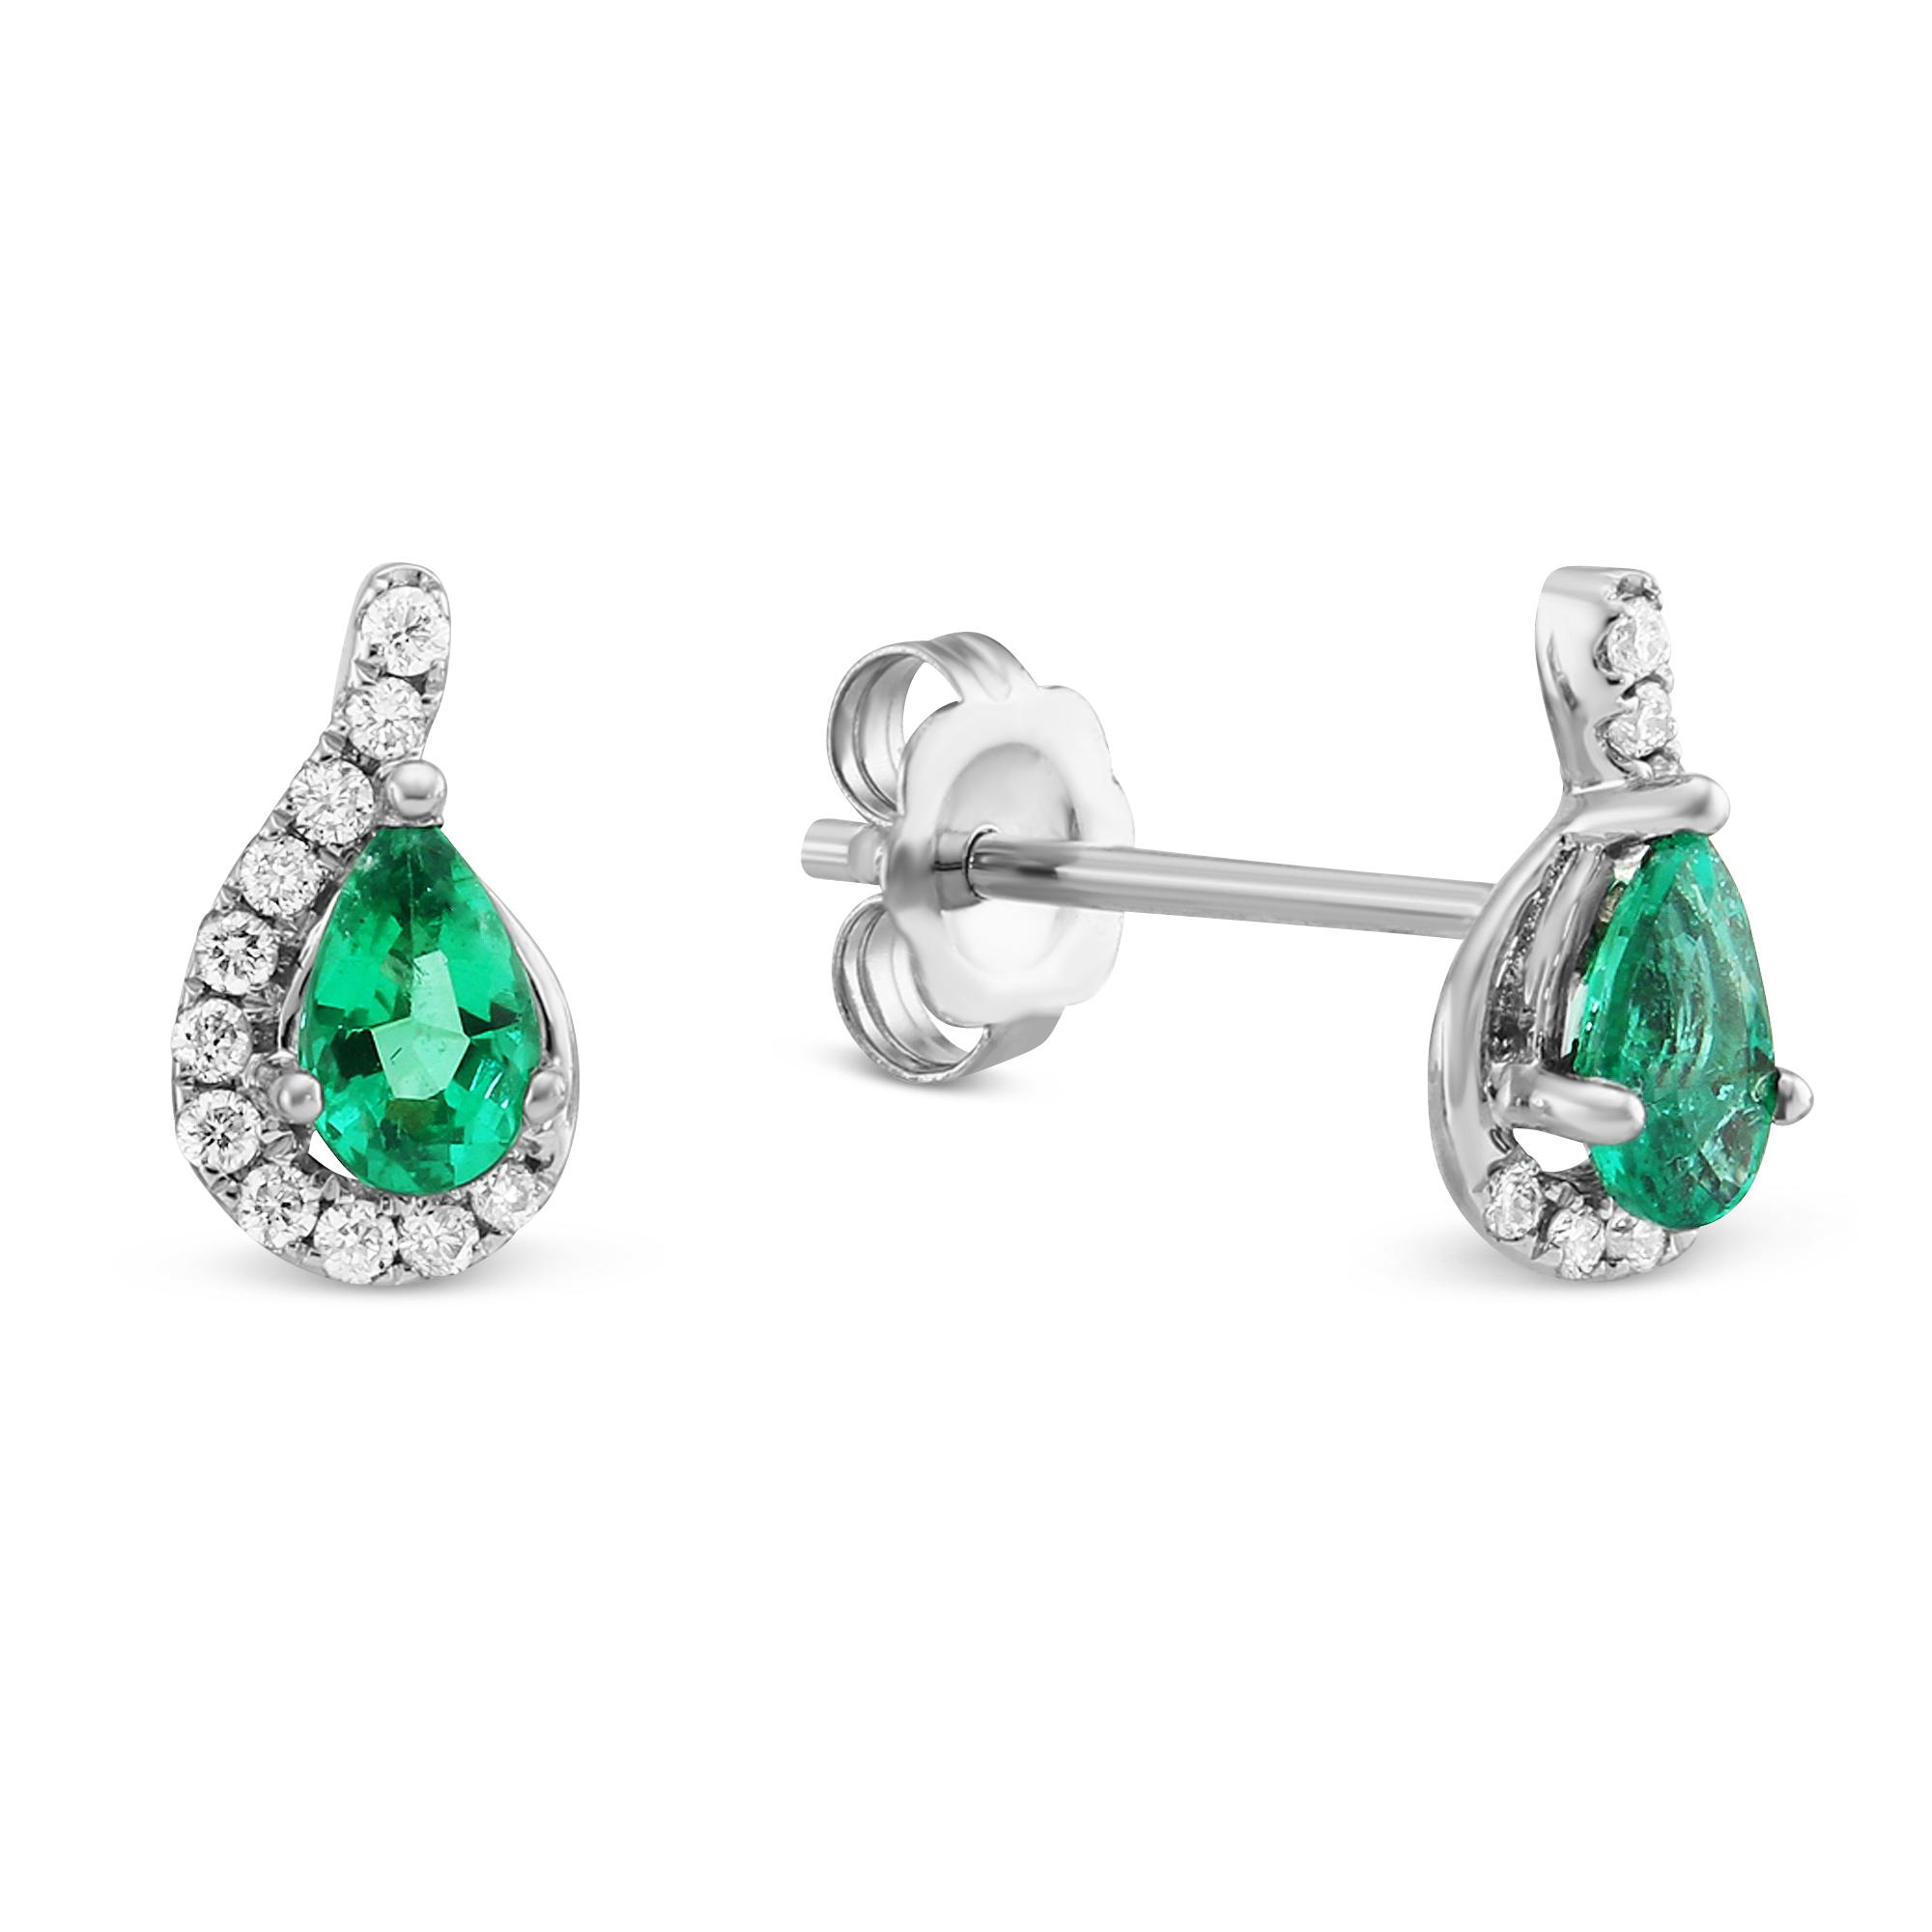 14k White Gold Pear Shaped Emerald Diamond Earrings